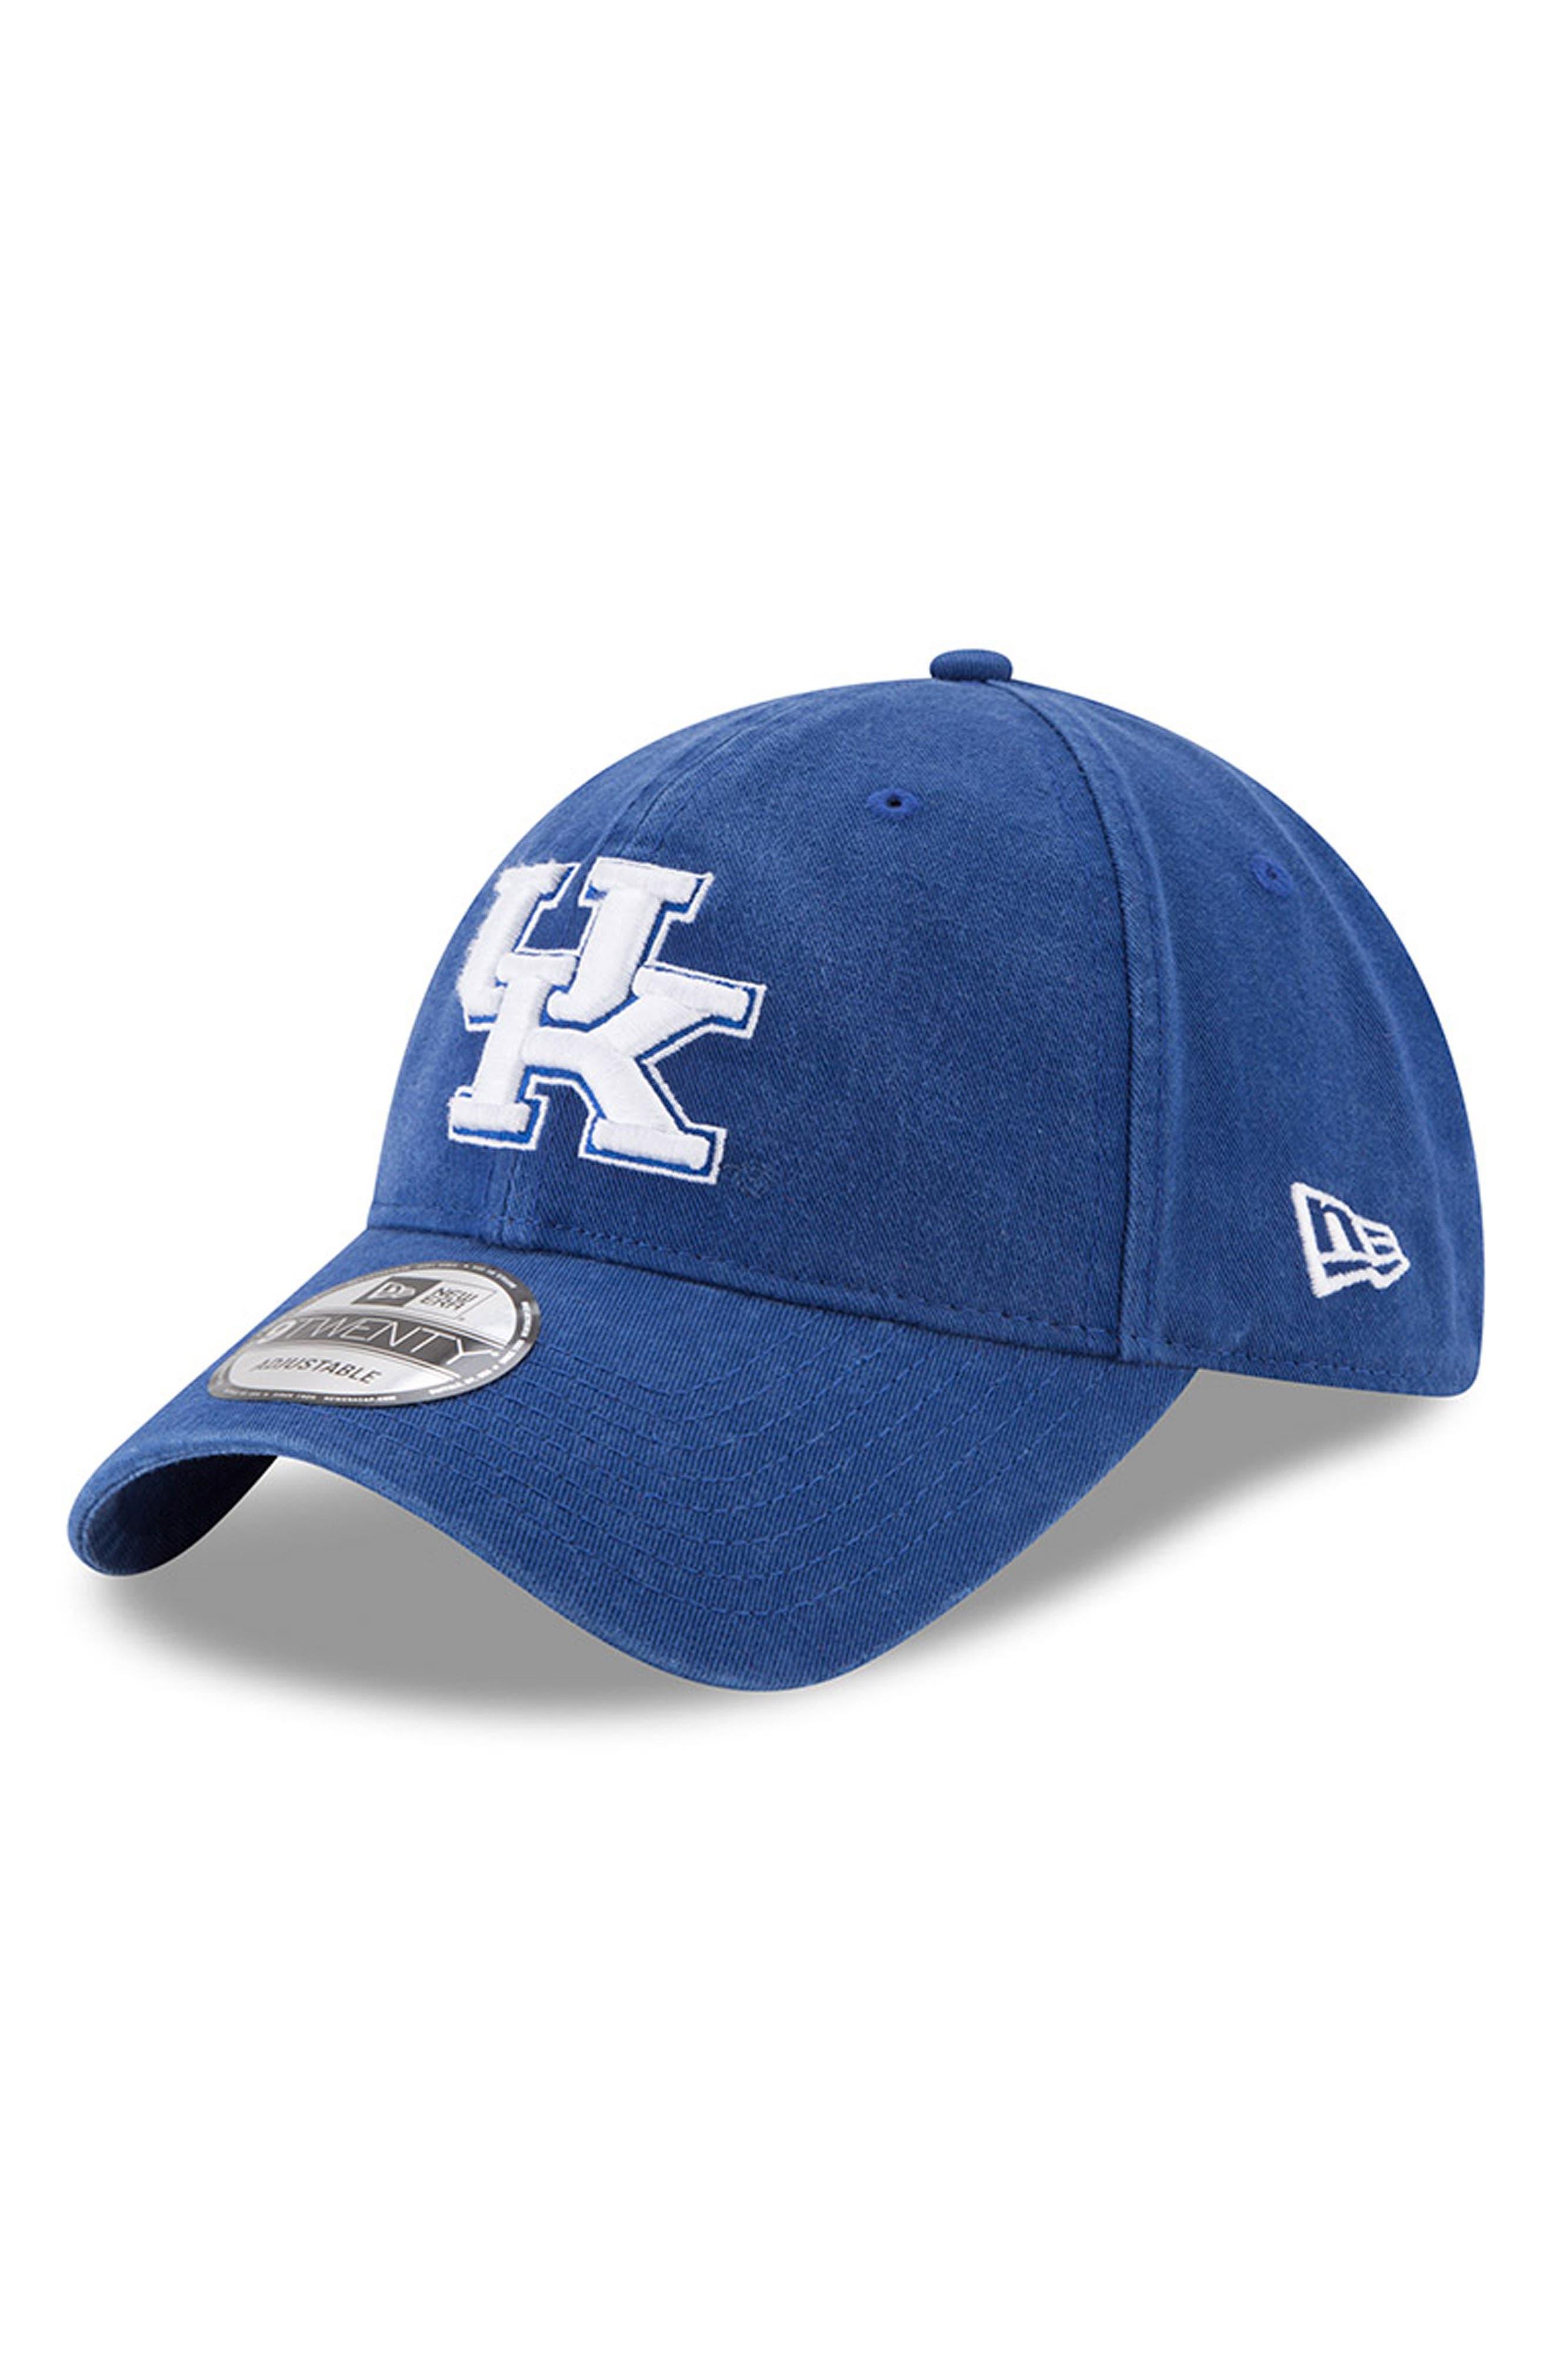 New Era Collegiate Core Classic - Kentucky Wildcats Baseball Cap,                             Main thumbnail 1, color,                             Kentucky Wildcats